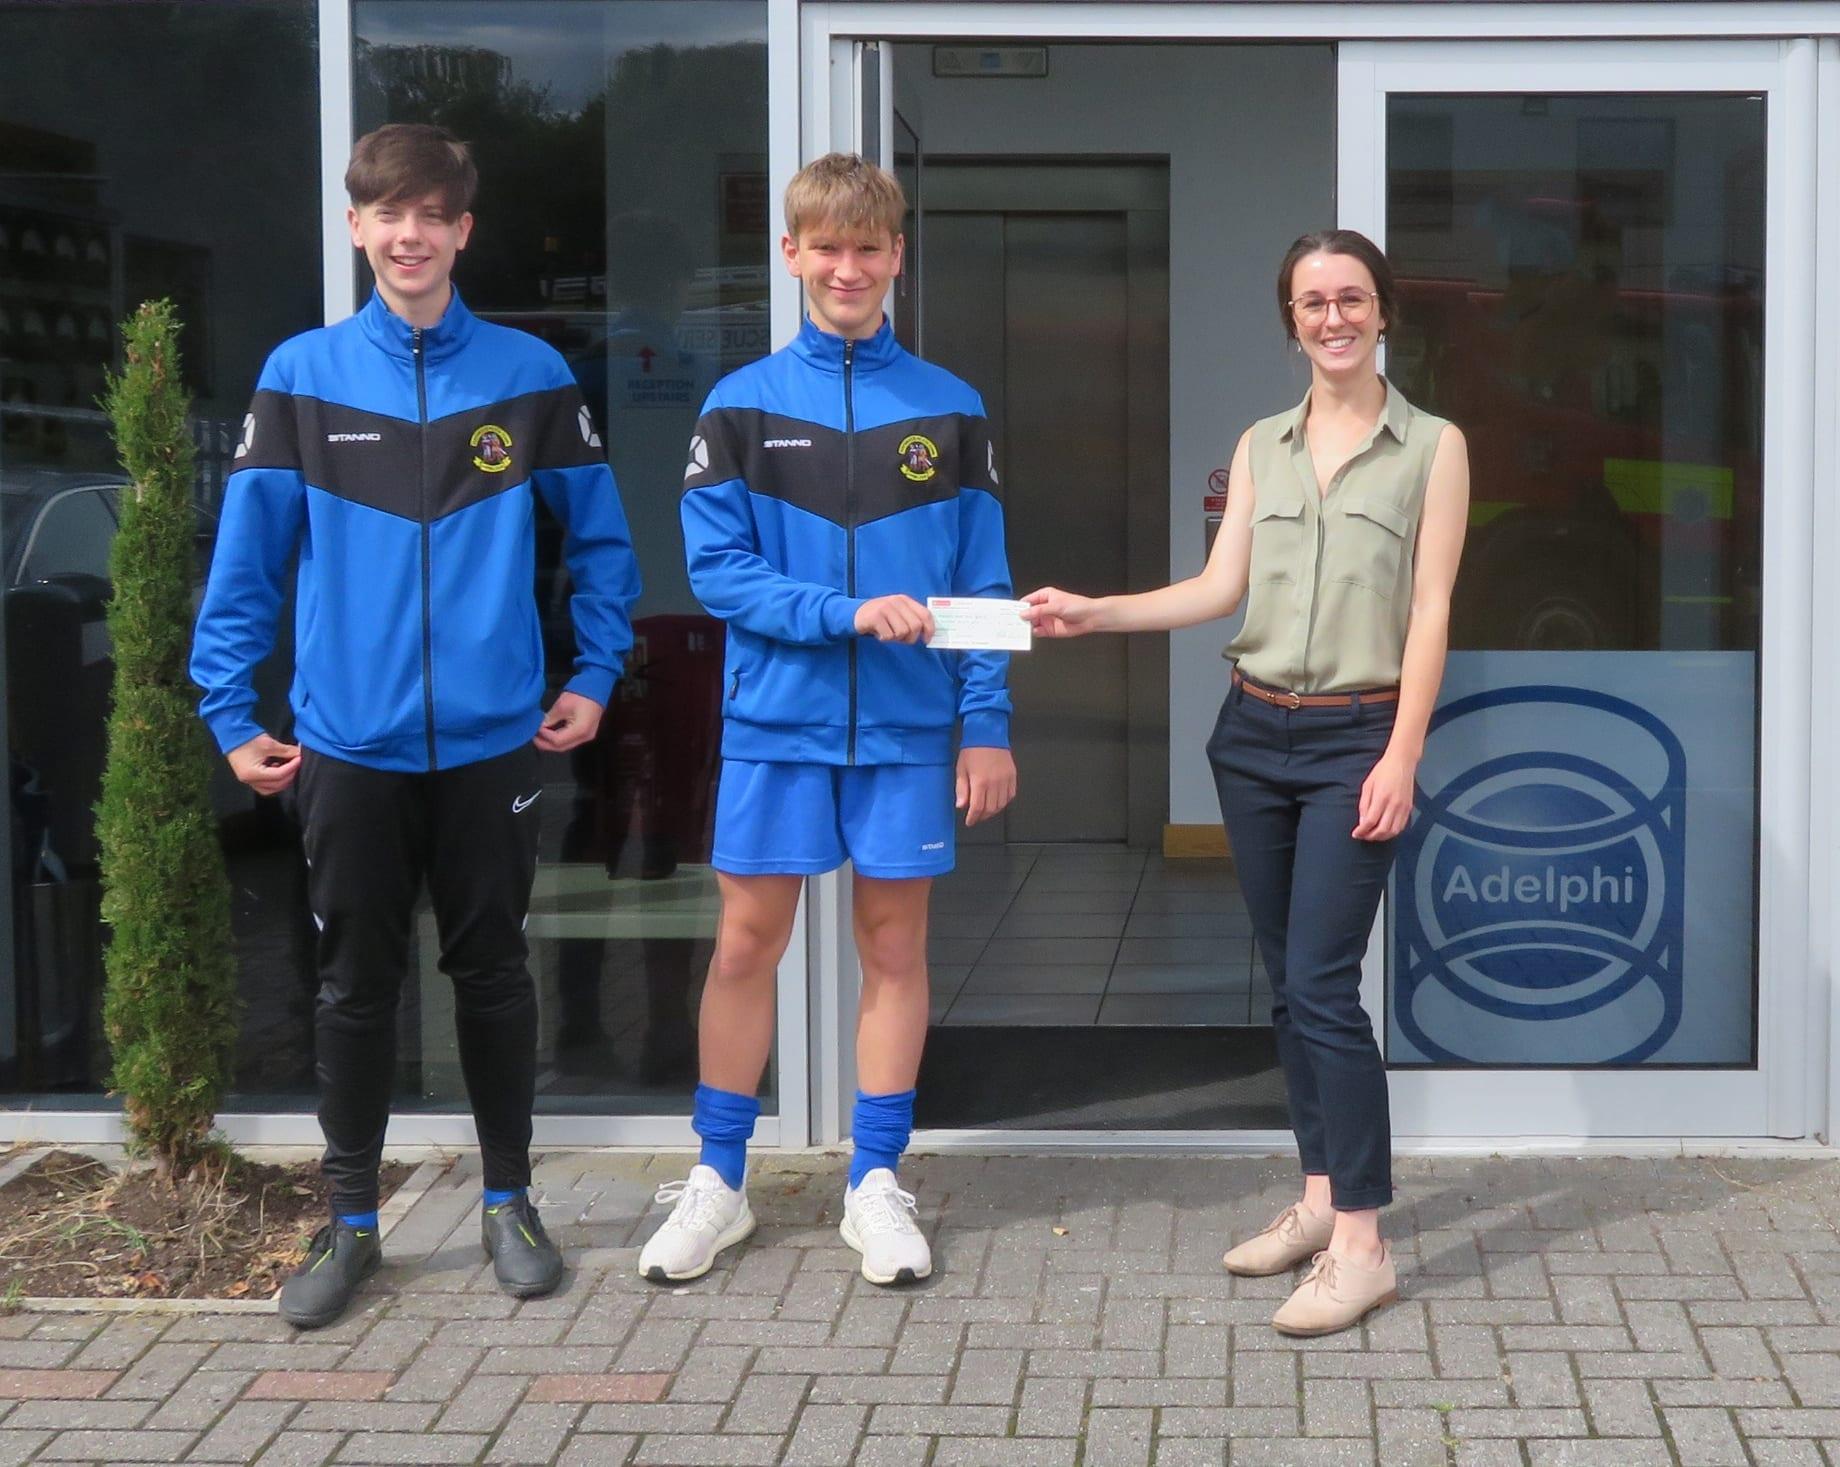 Adelphi sponsor Haywards Heath Town Youth FC